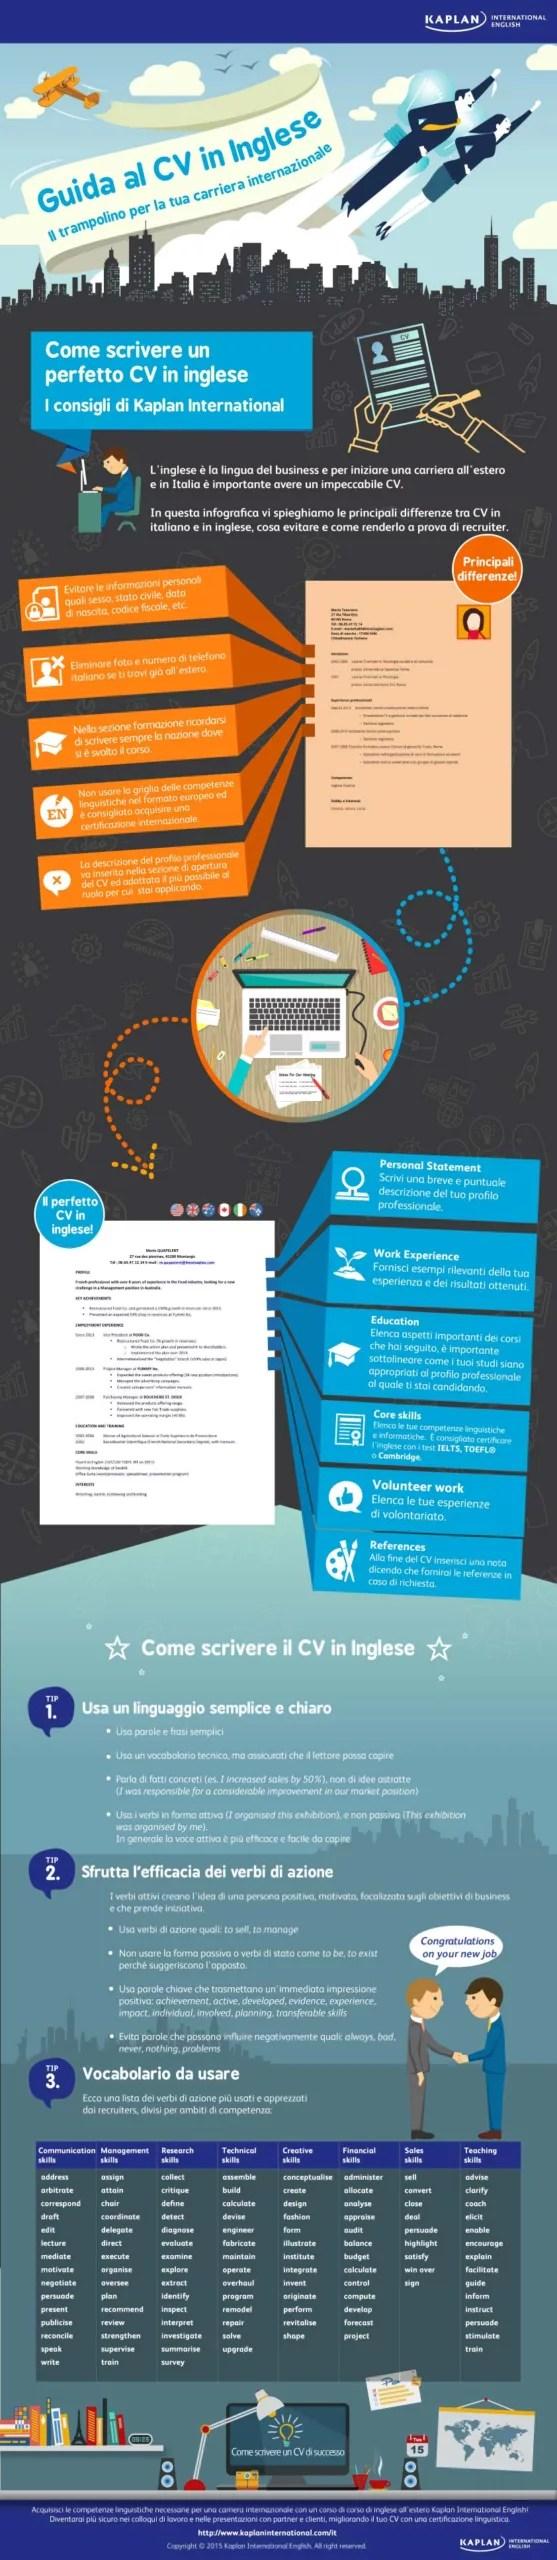 Infographic-Engish-cv